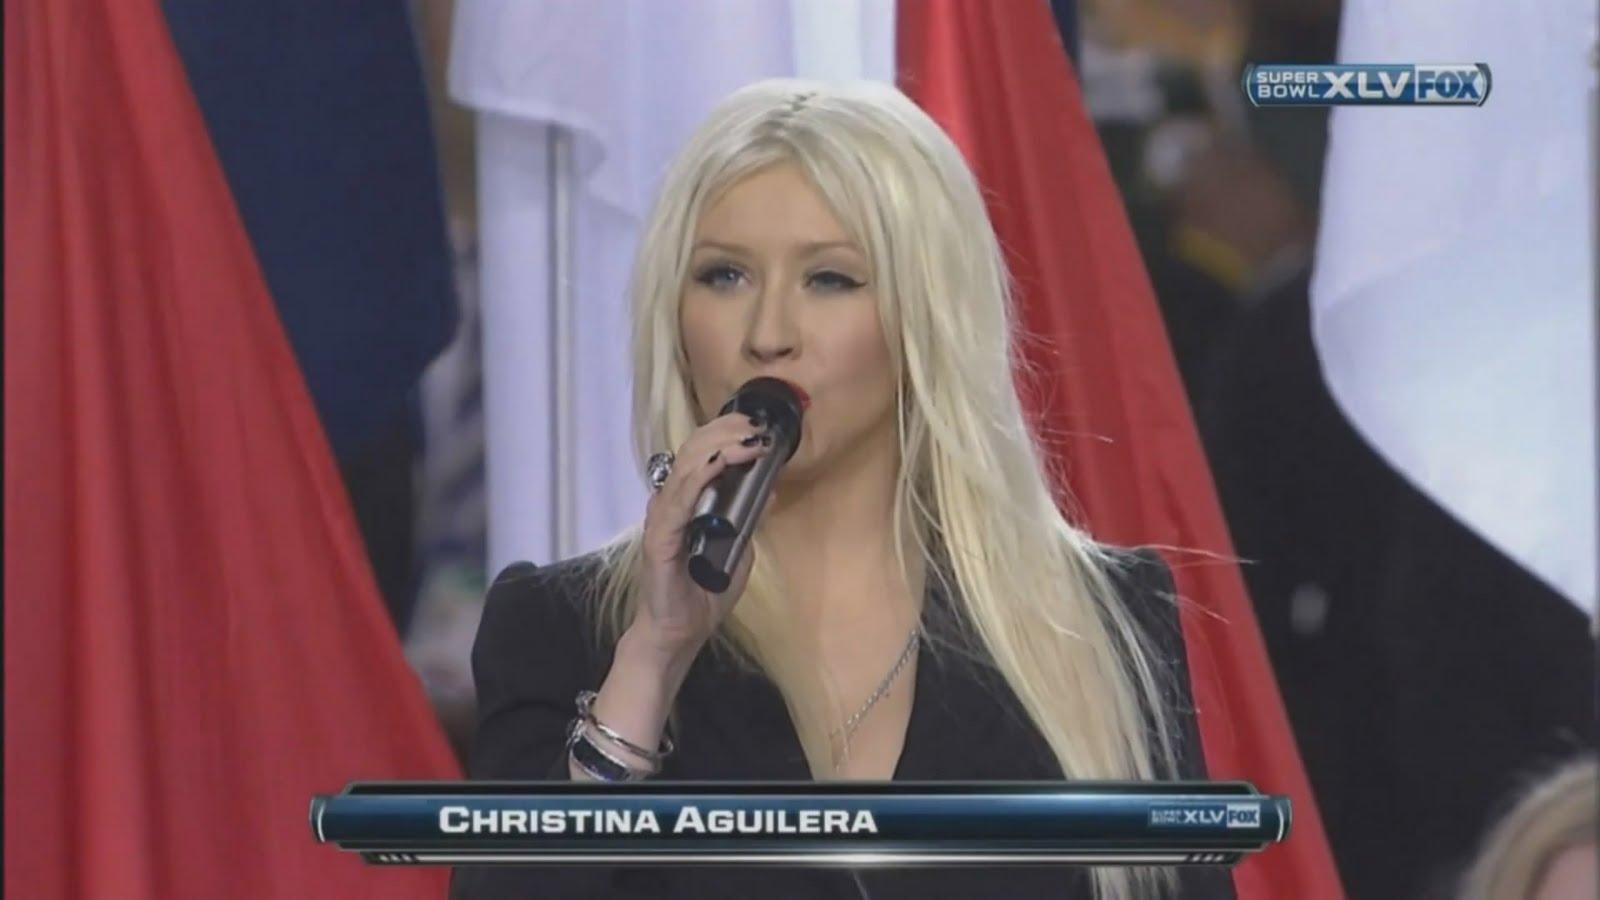 christina aguilera national anthem sucked jpg 1080x810